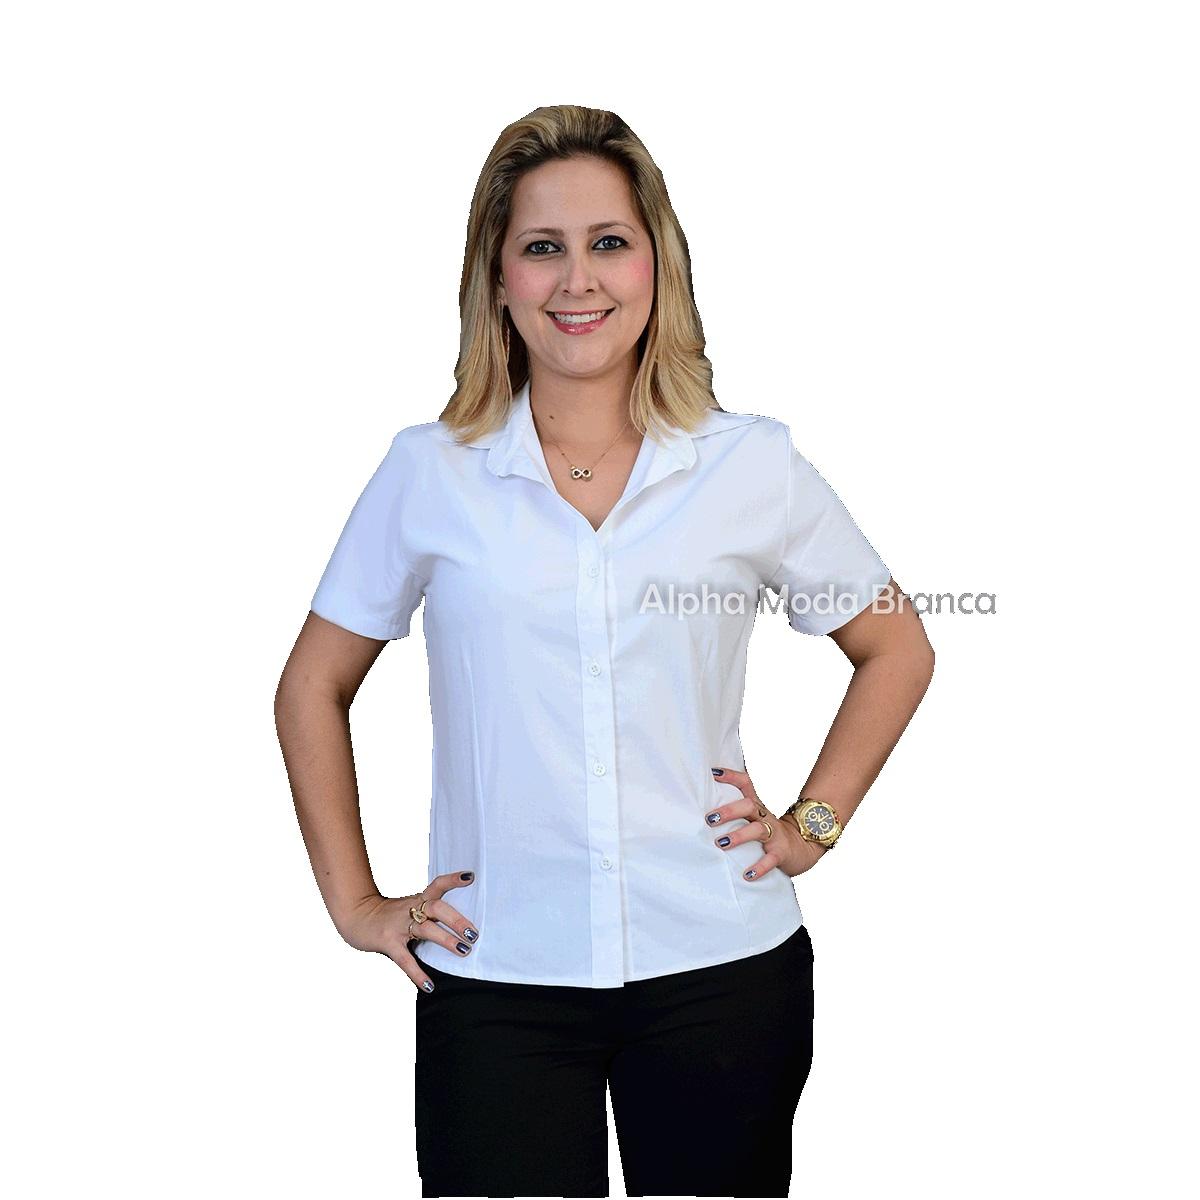 a18de09081 Camisa Social Feminina Manga Curta Gola Esporte - Alpha Moda Social